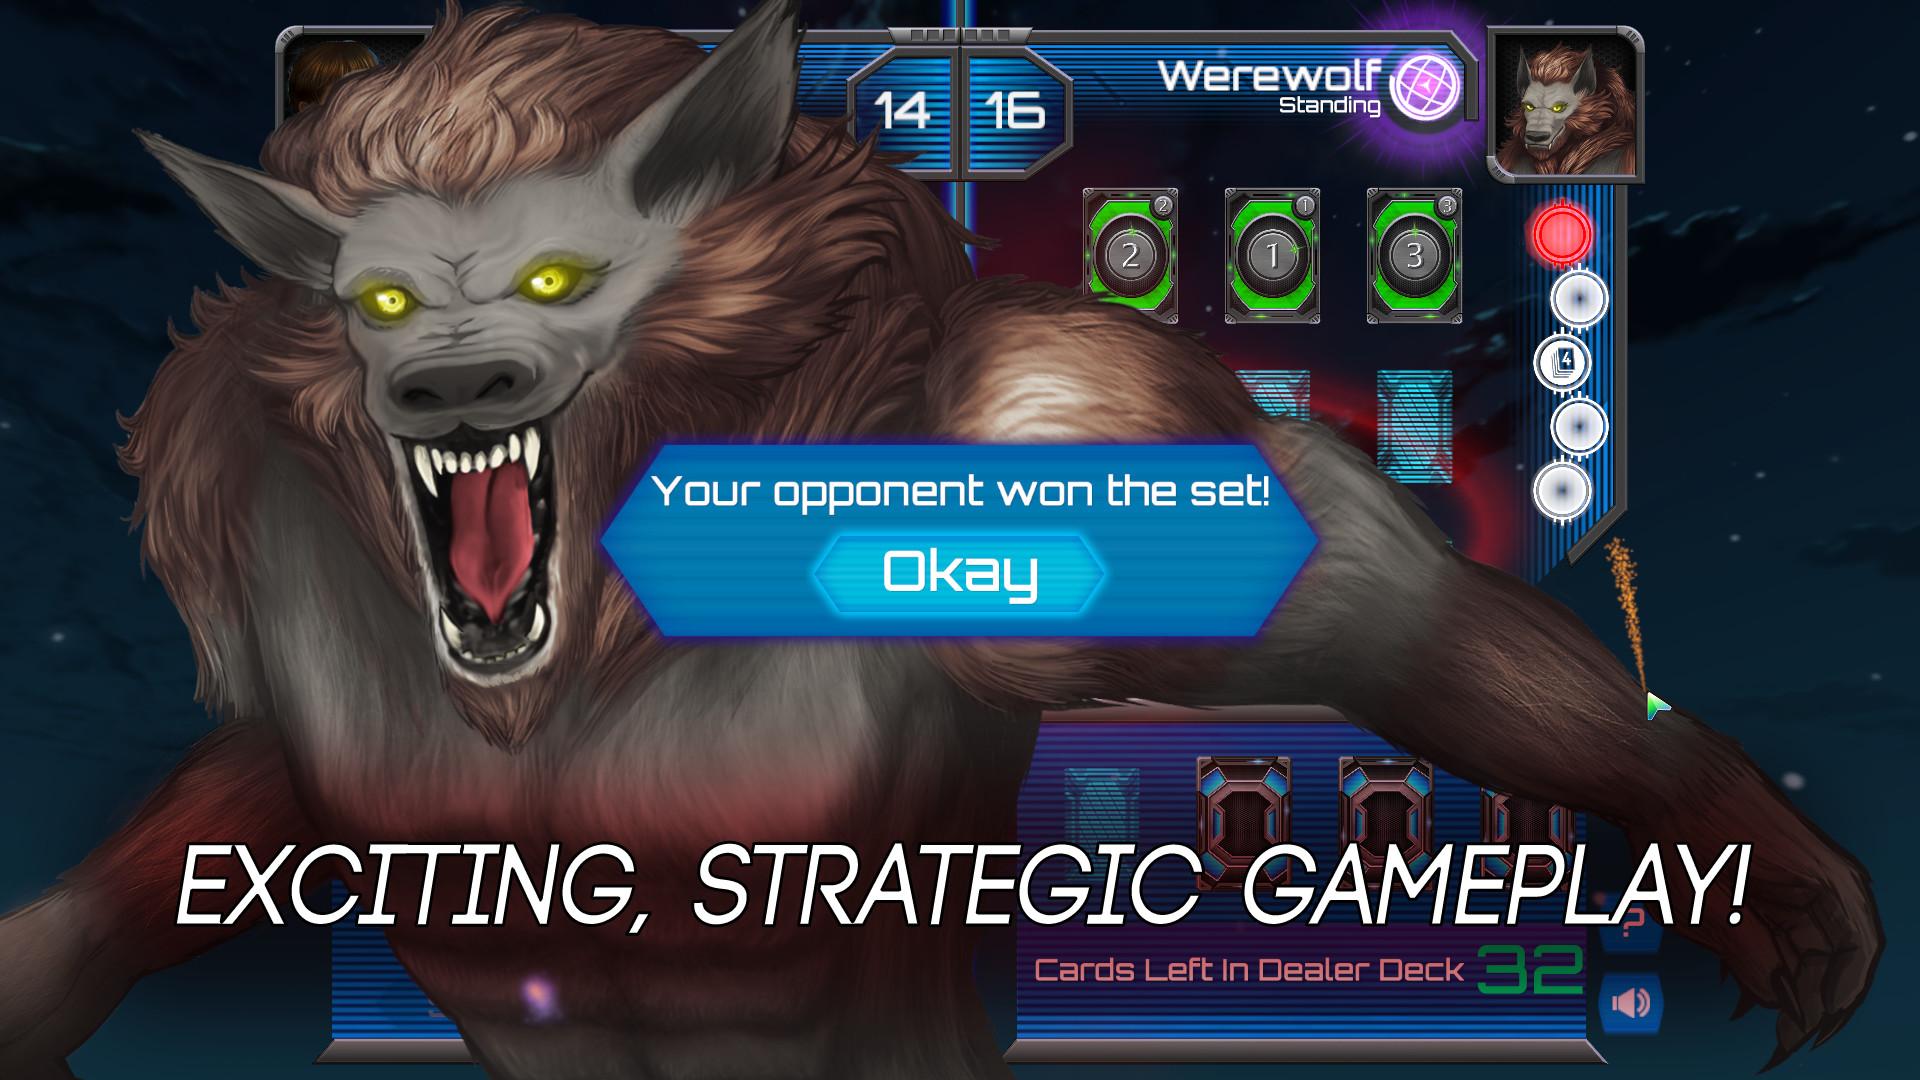 Exciting Strategic Gameplay!